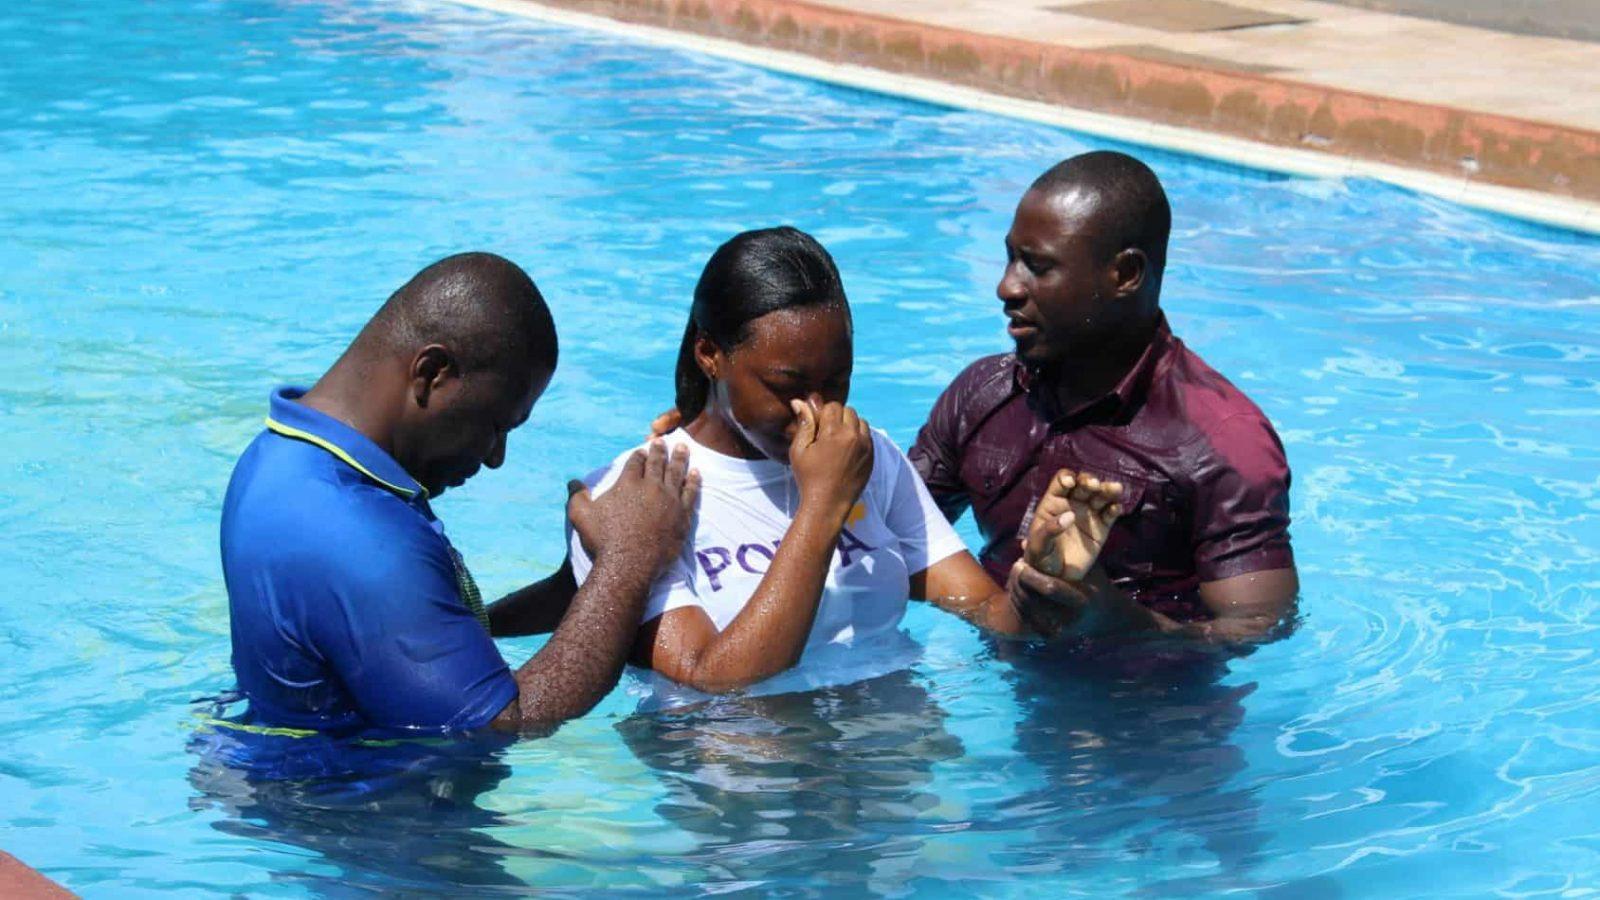 BAPTISM-1-1688x1125